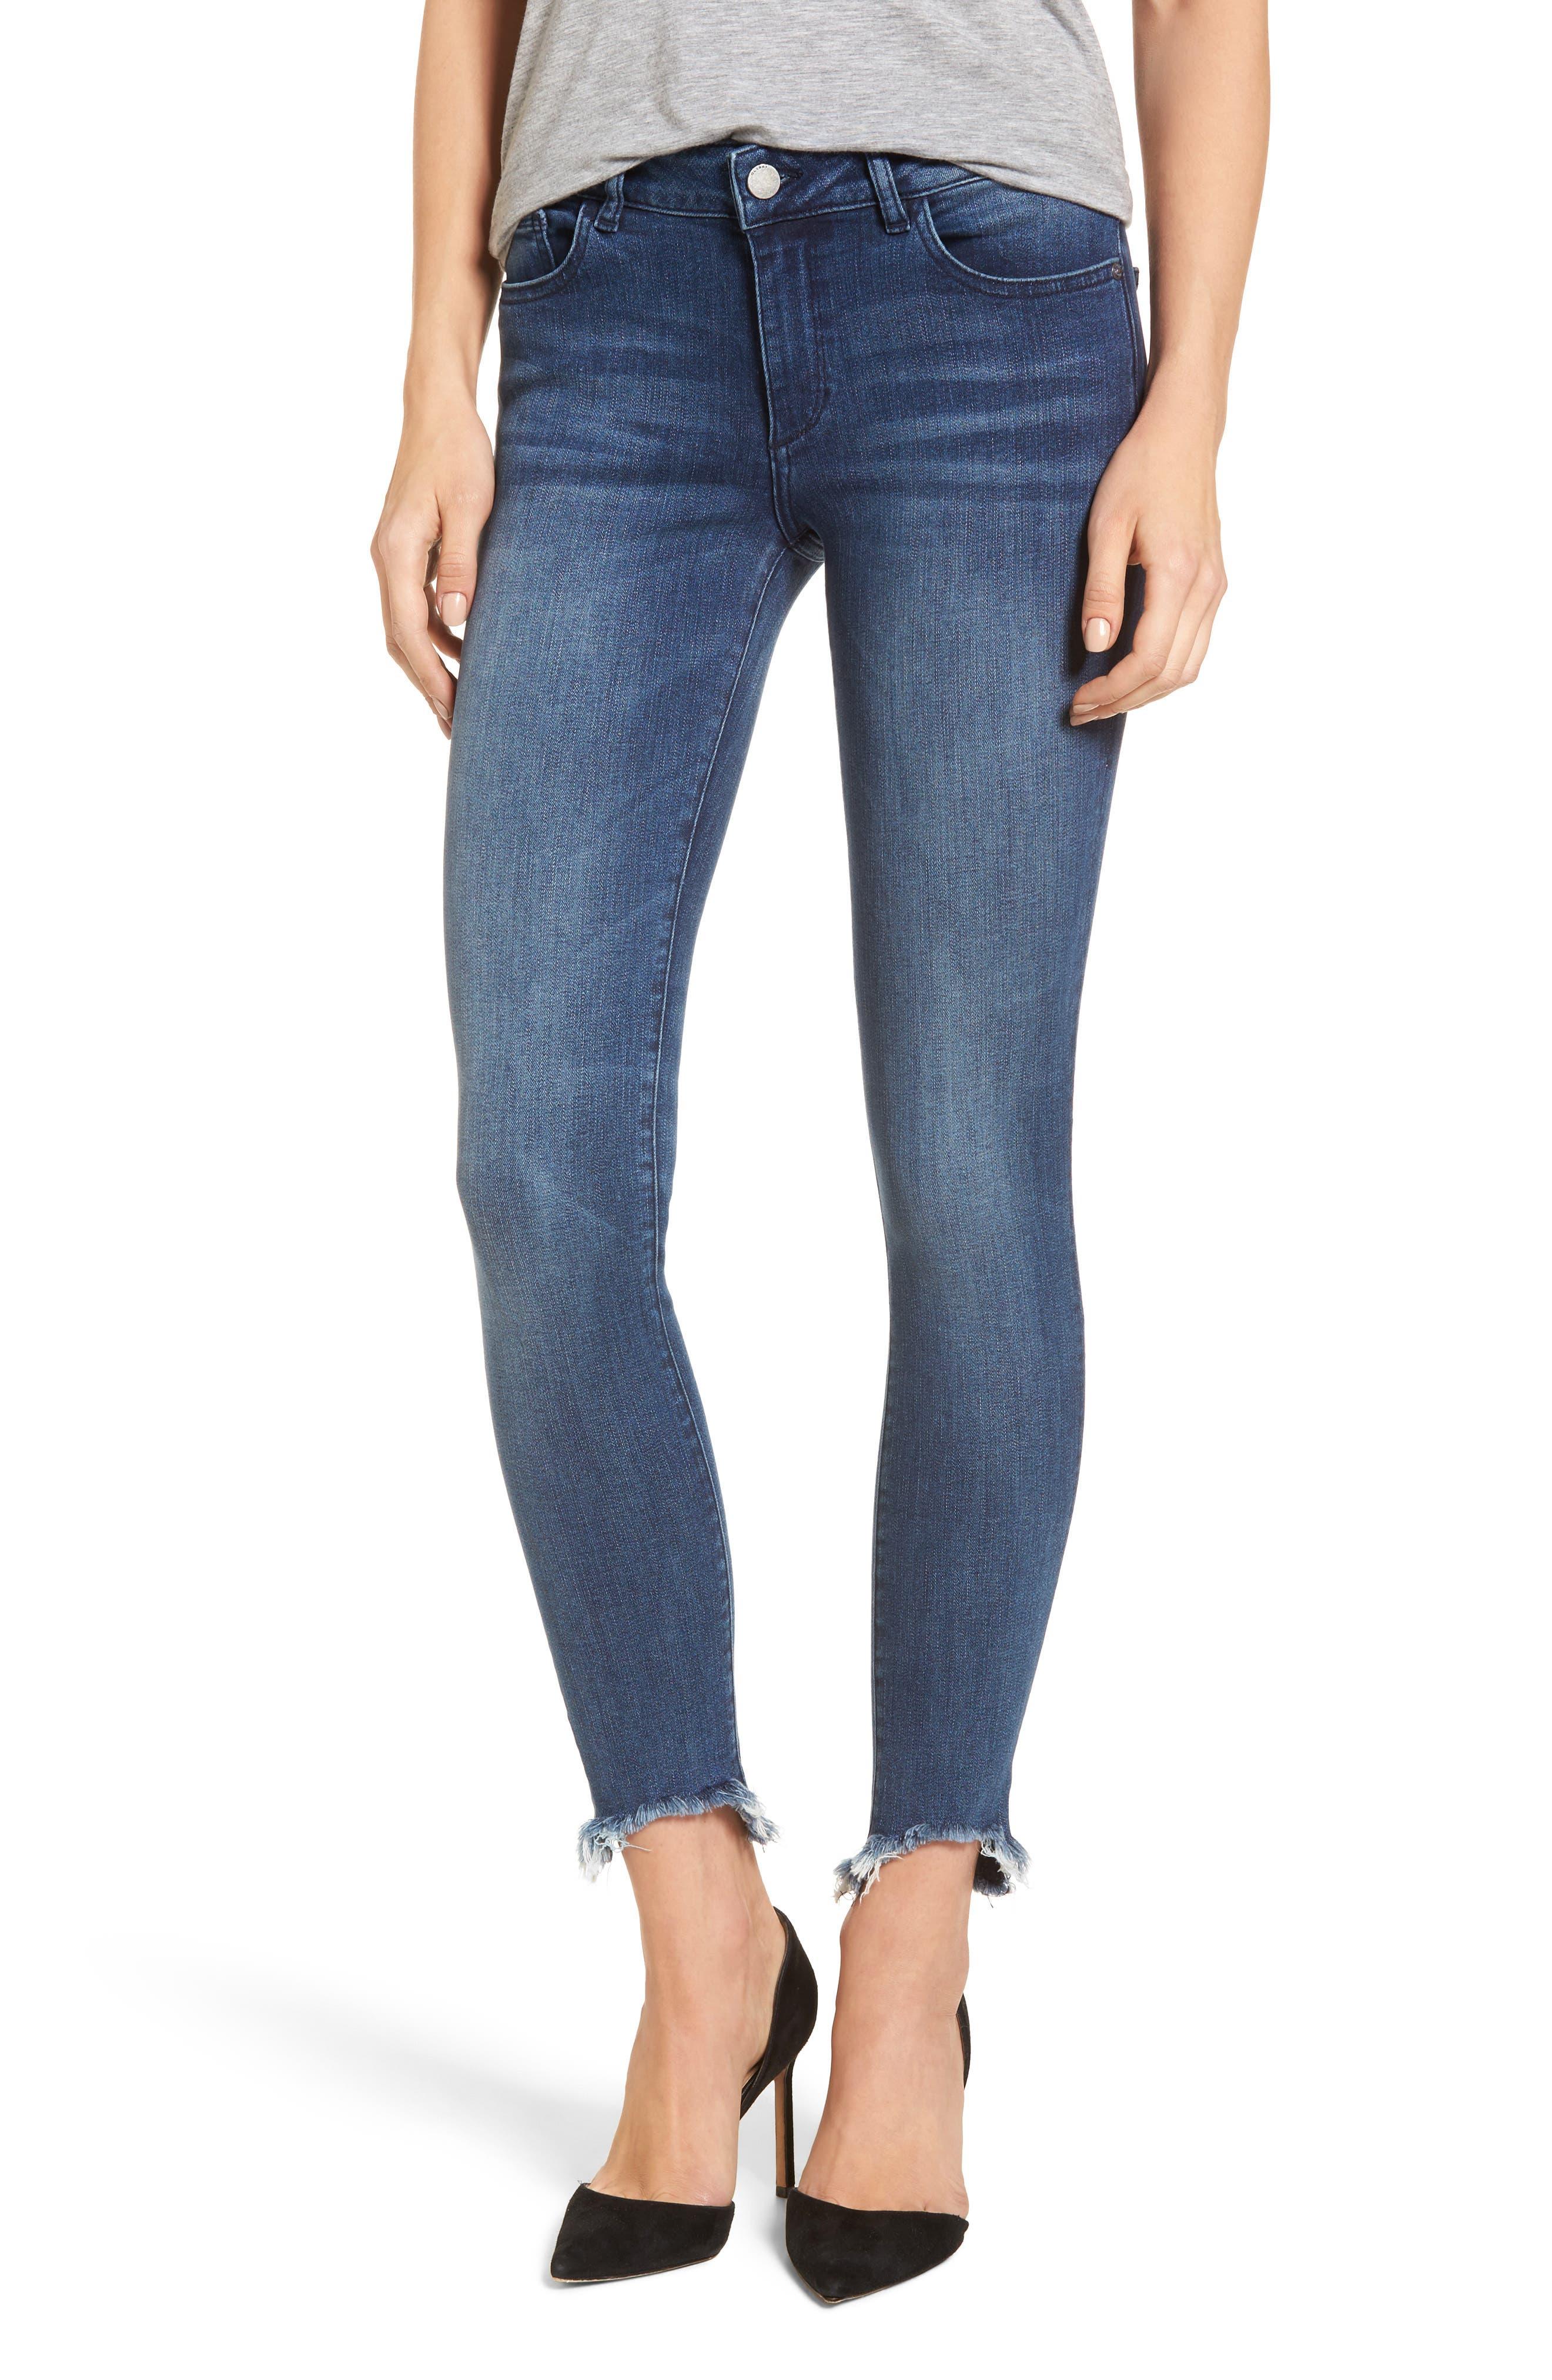 Emma Power Legging Jeans,                             Main thumbnail 1, color,                             Fenwick